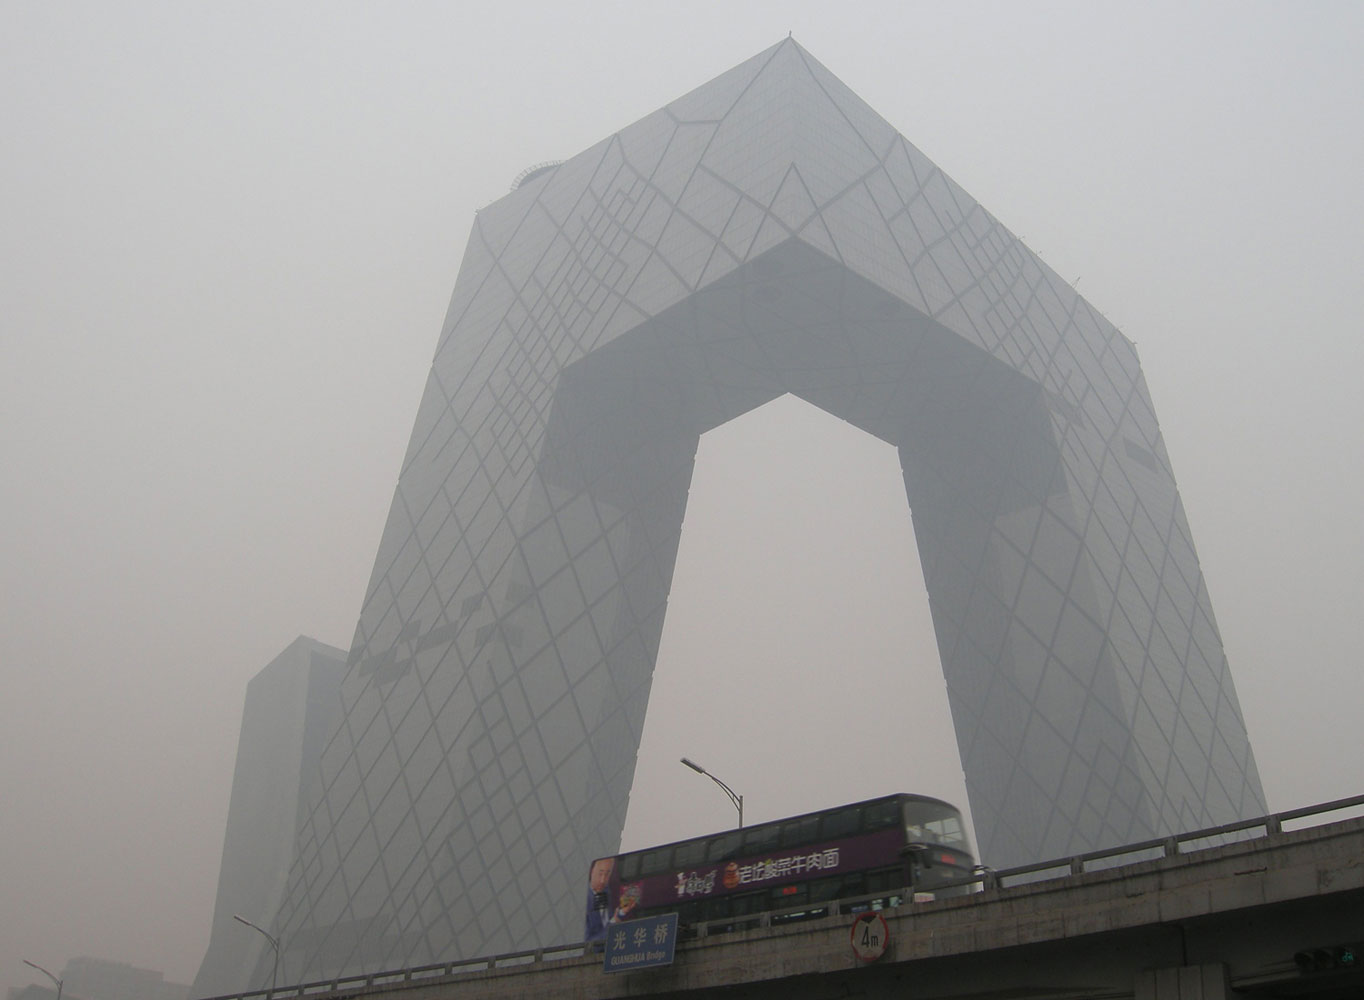 CCTV Building is shrouded in heavy smog on Feb. 25, 2014, in Beijing.